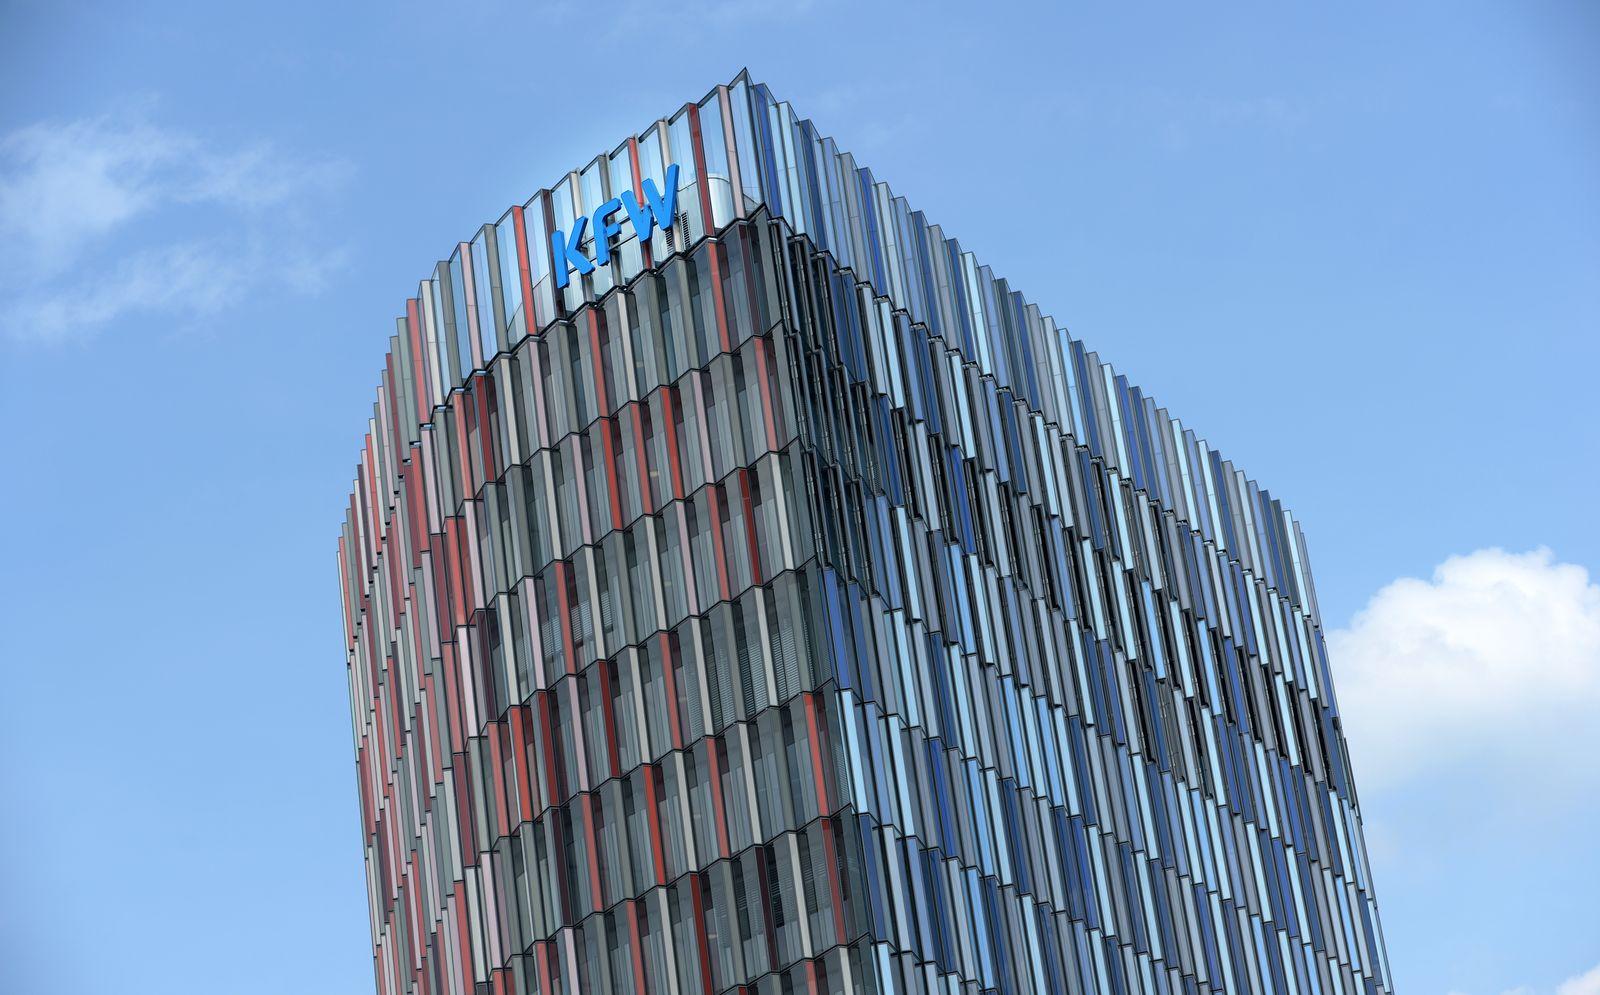 Förderbank KfW in Frankfurt